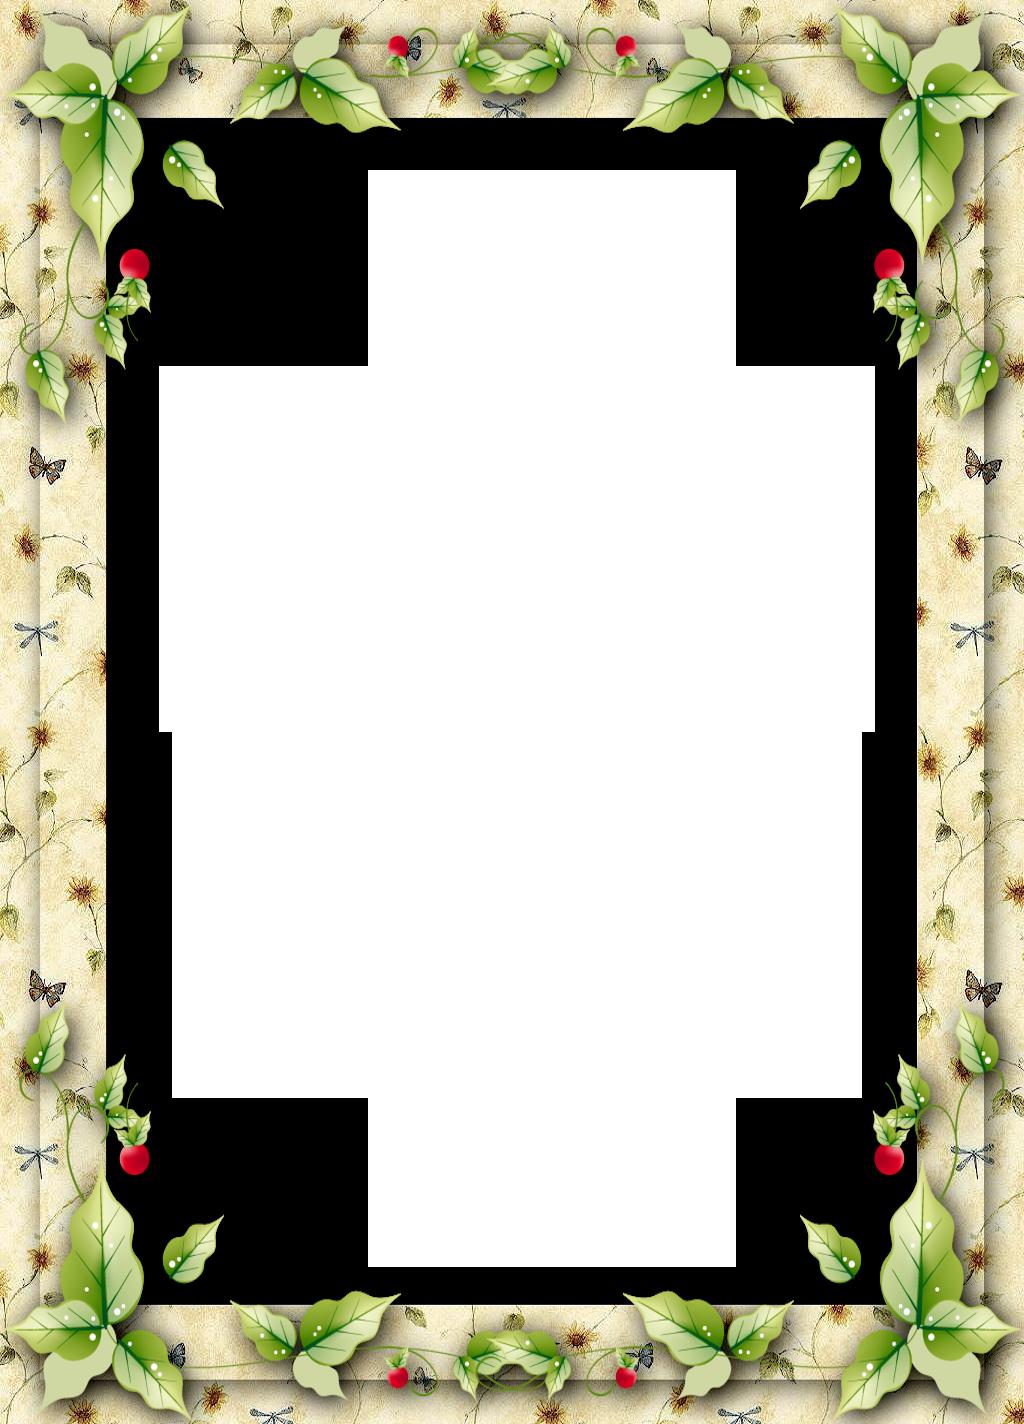 christmas frame with mistletoe